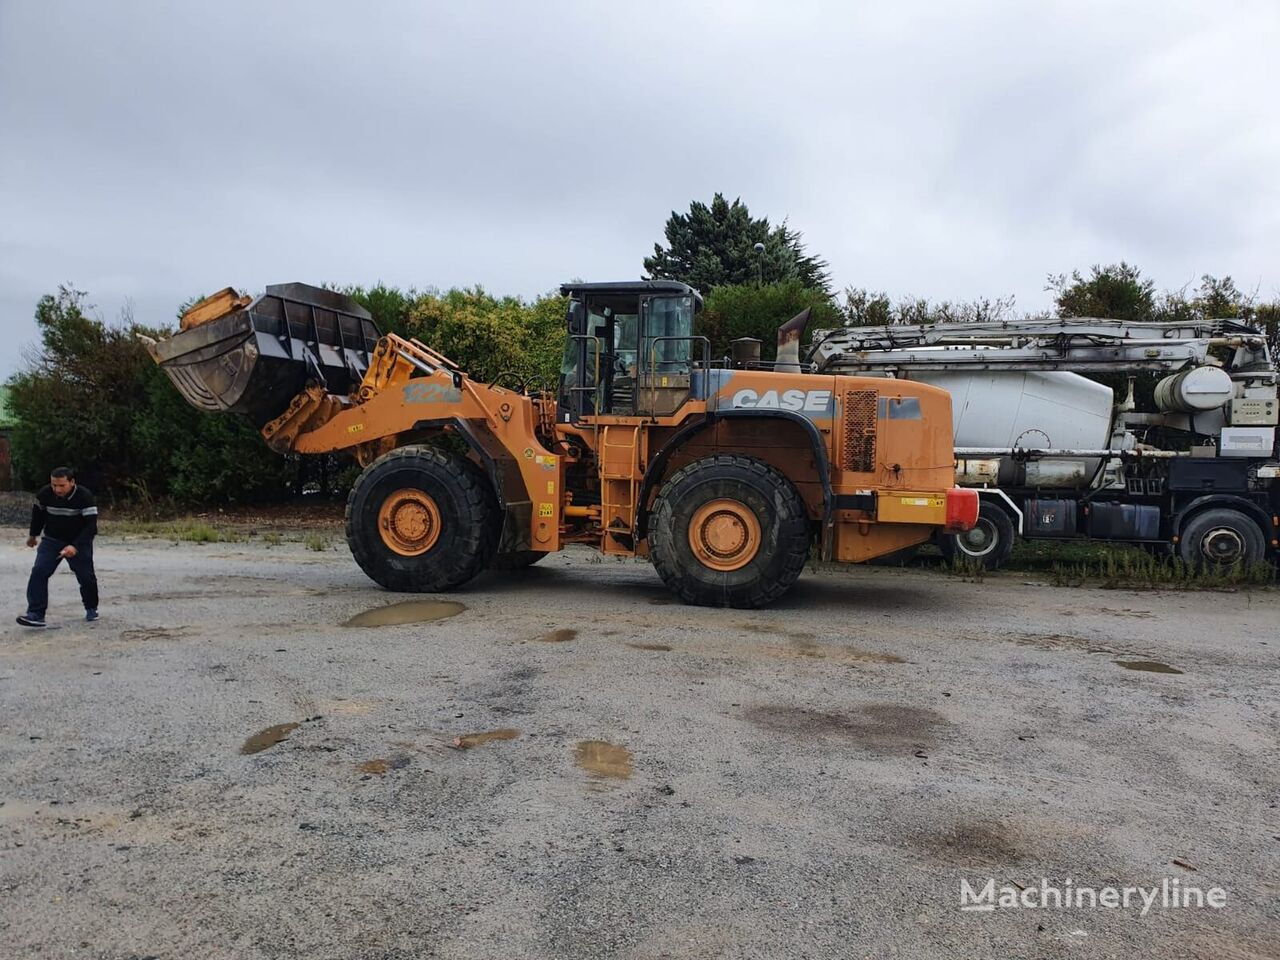 CASE 1221E wheel loader